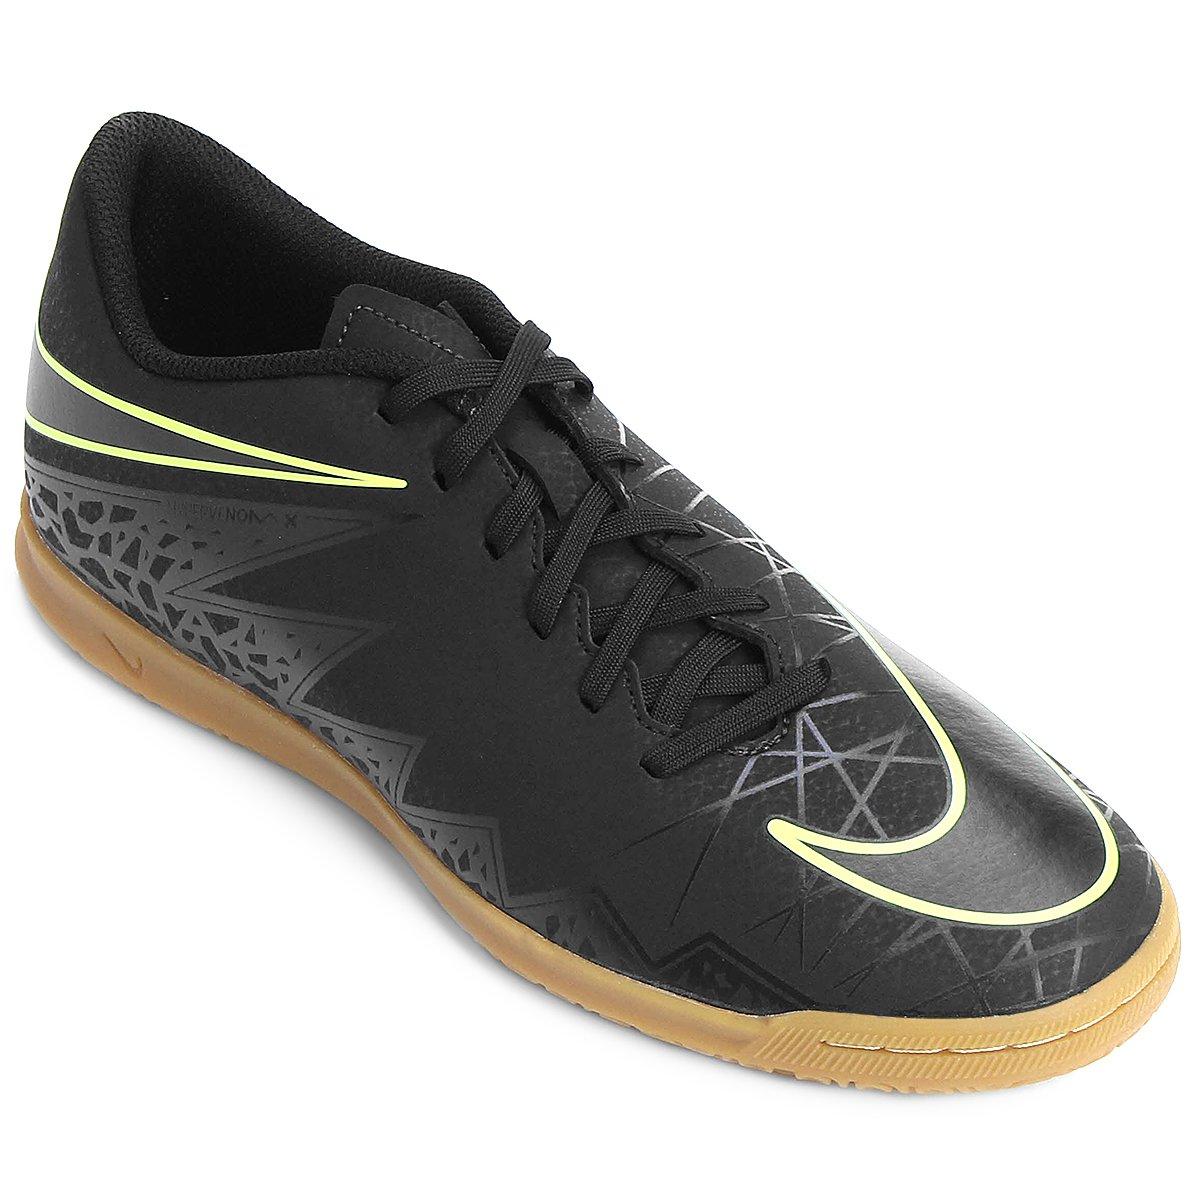 4ae77bc4fb Chuteira Futsal Nike Hypervenom Phade 2 IC - Compre Agora